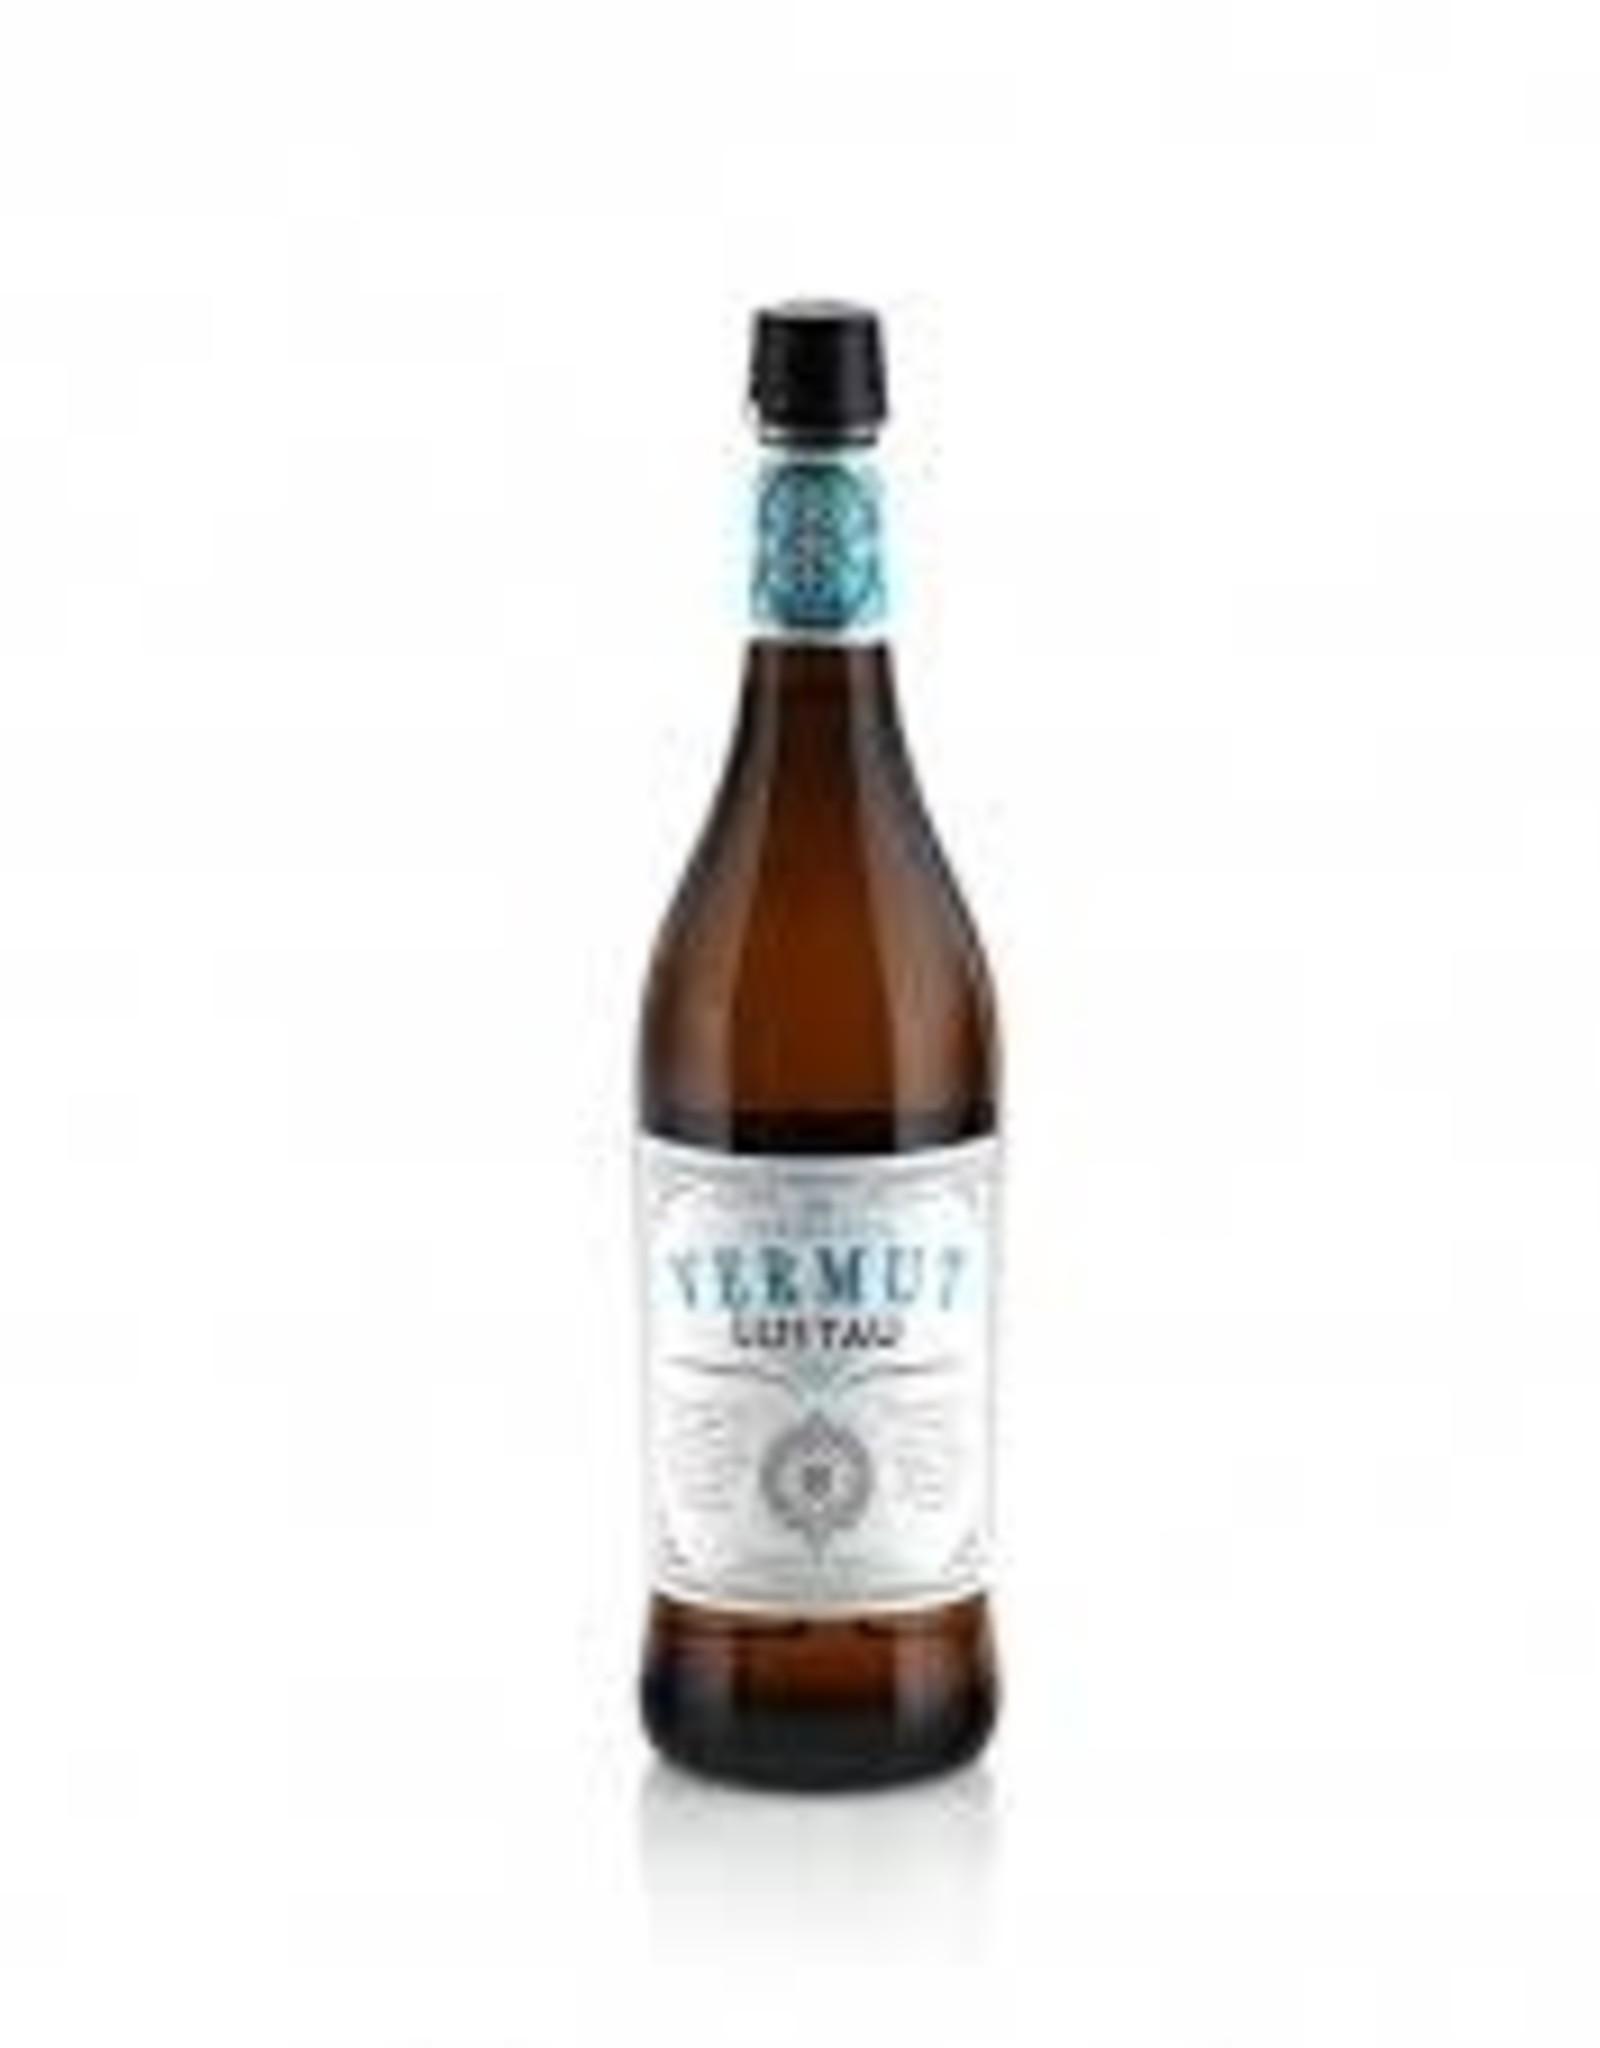 Spirits Vermouth BLANCO, Vermut, Lustau